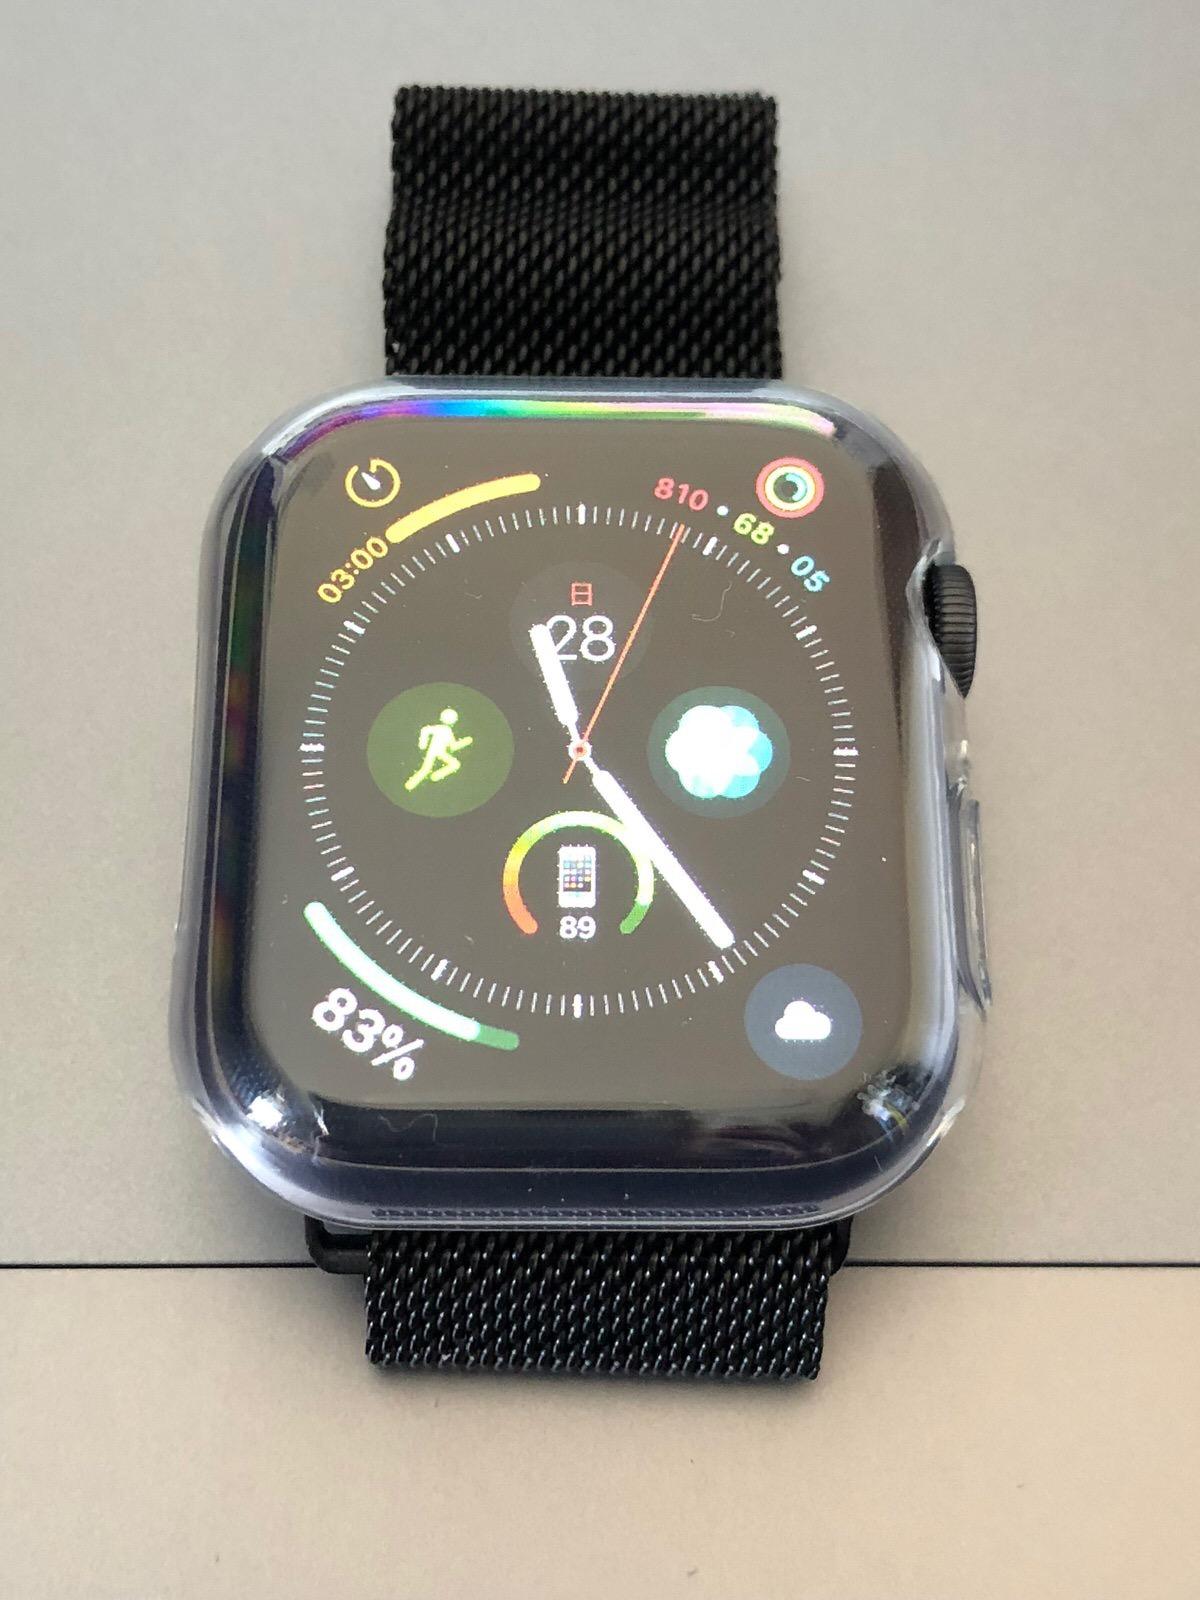 TOWOOZ【全面保護】Apple Watch 44MM ケース 透過率99% 柔軟 薄型Apple Watch Series 4 ケース-5